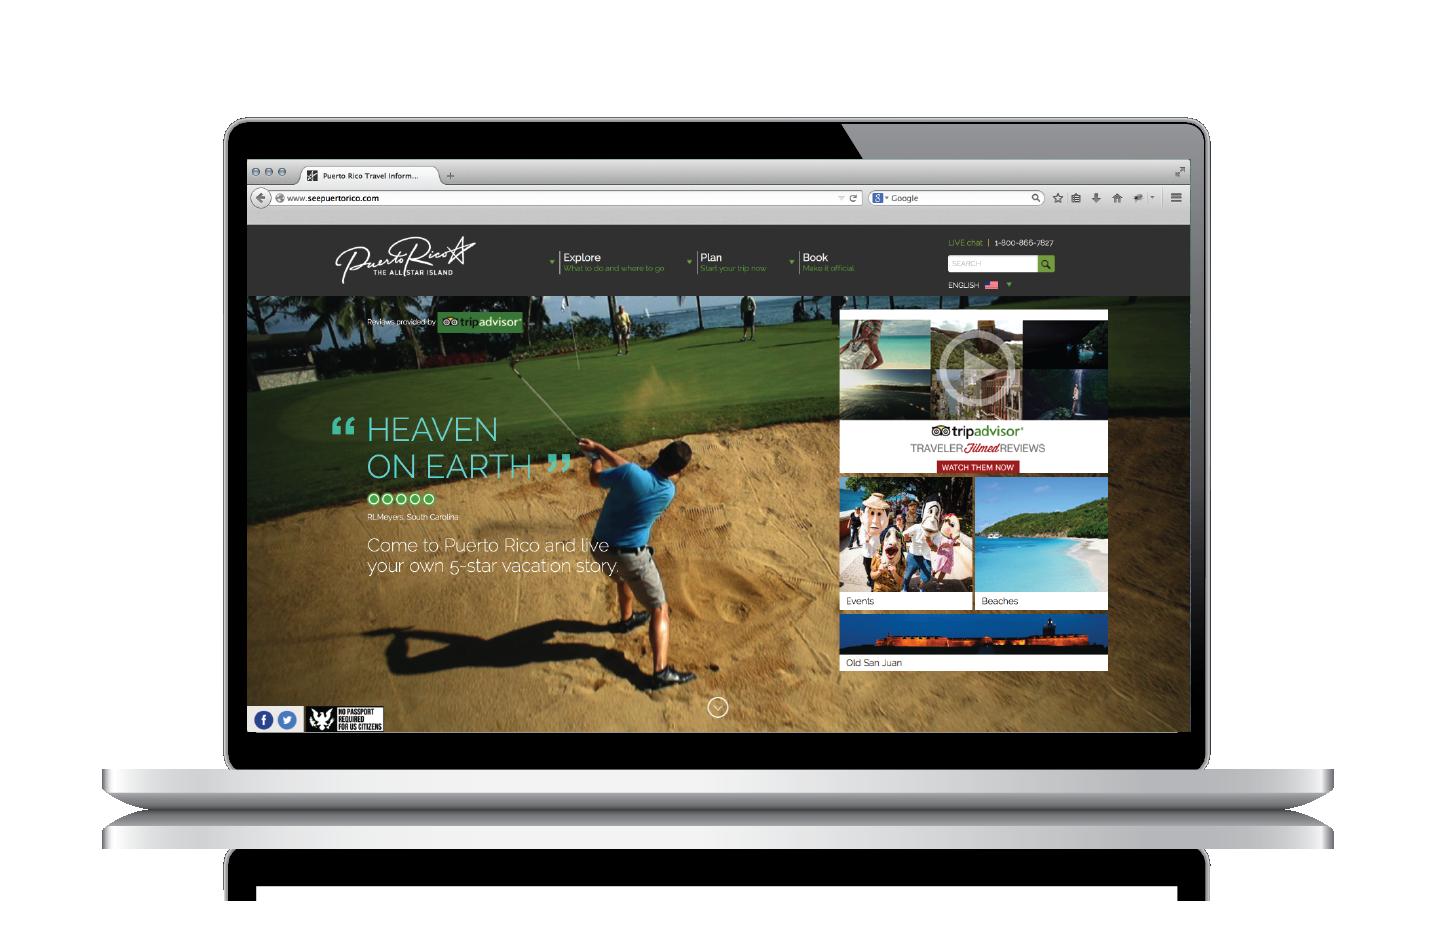 Puerto rico tourism company website